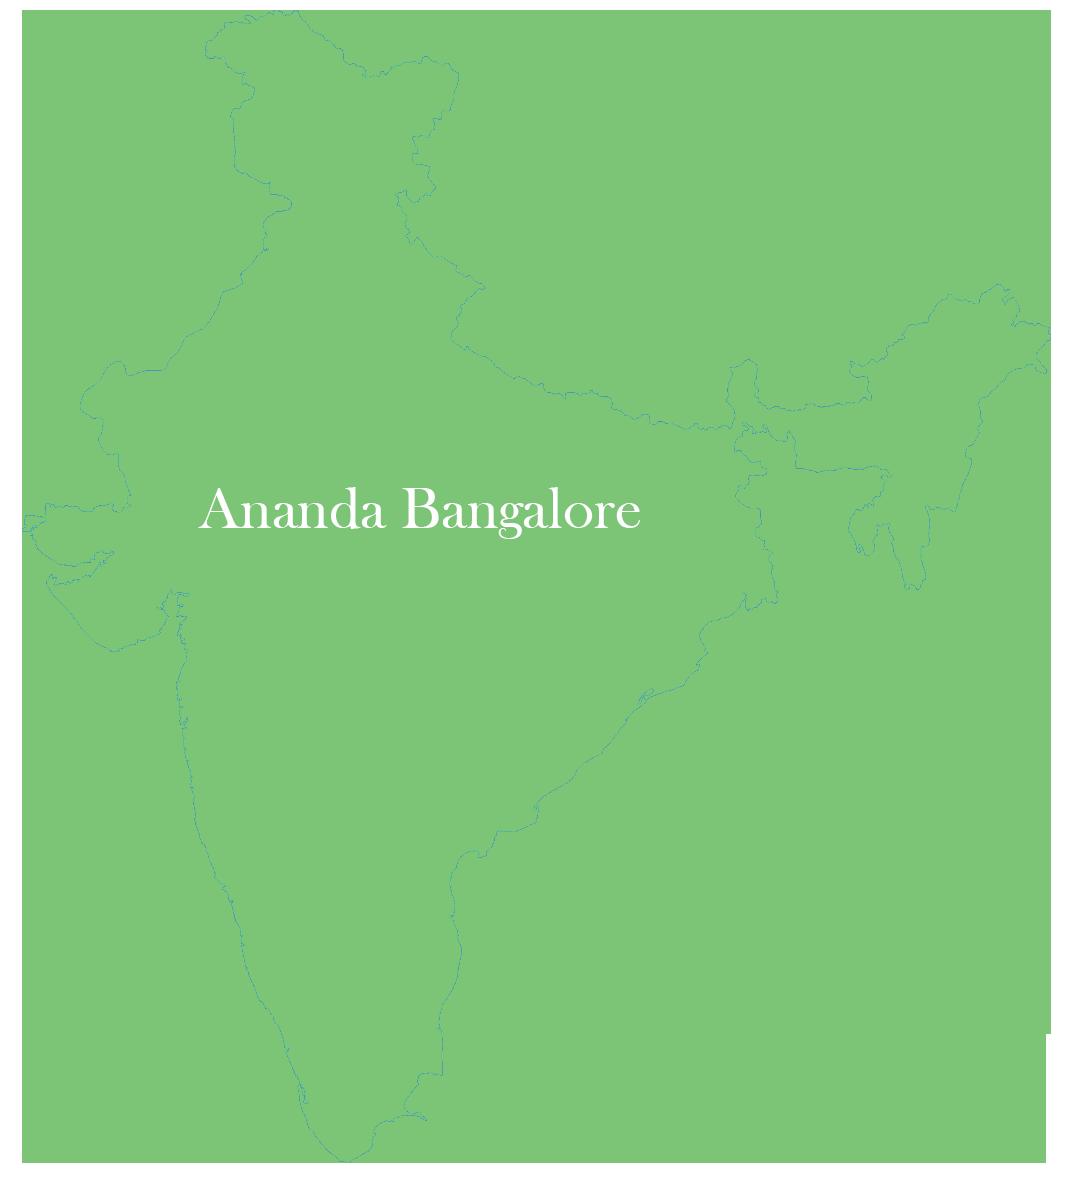 Ananda Bangalore